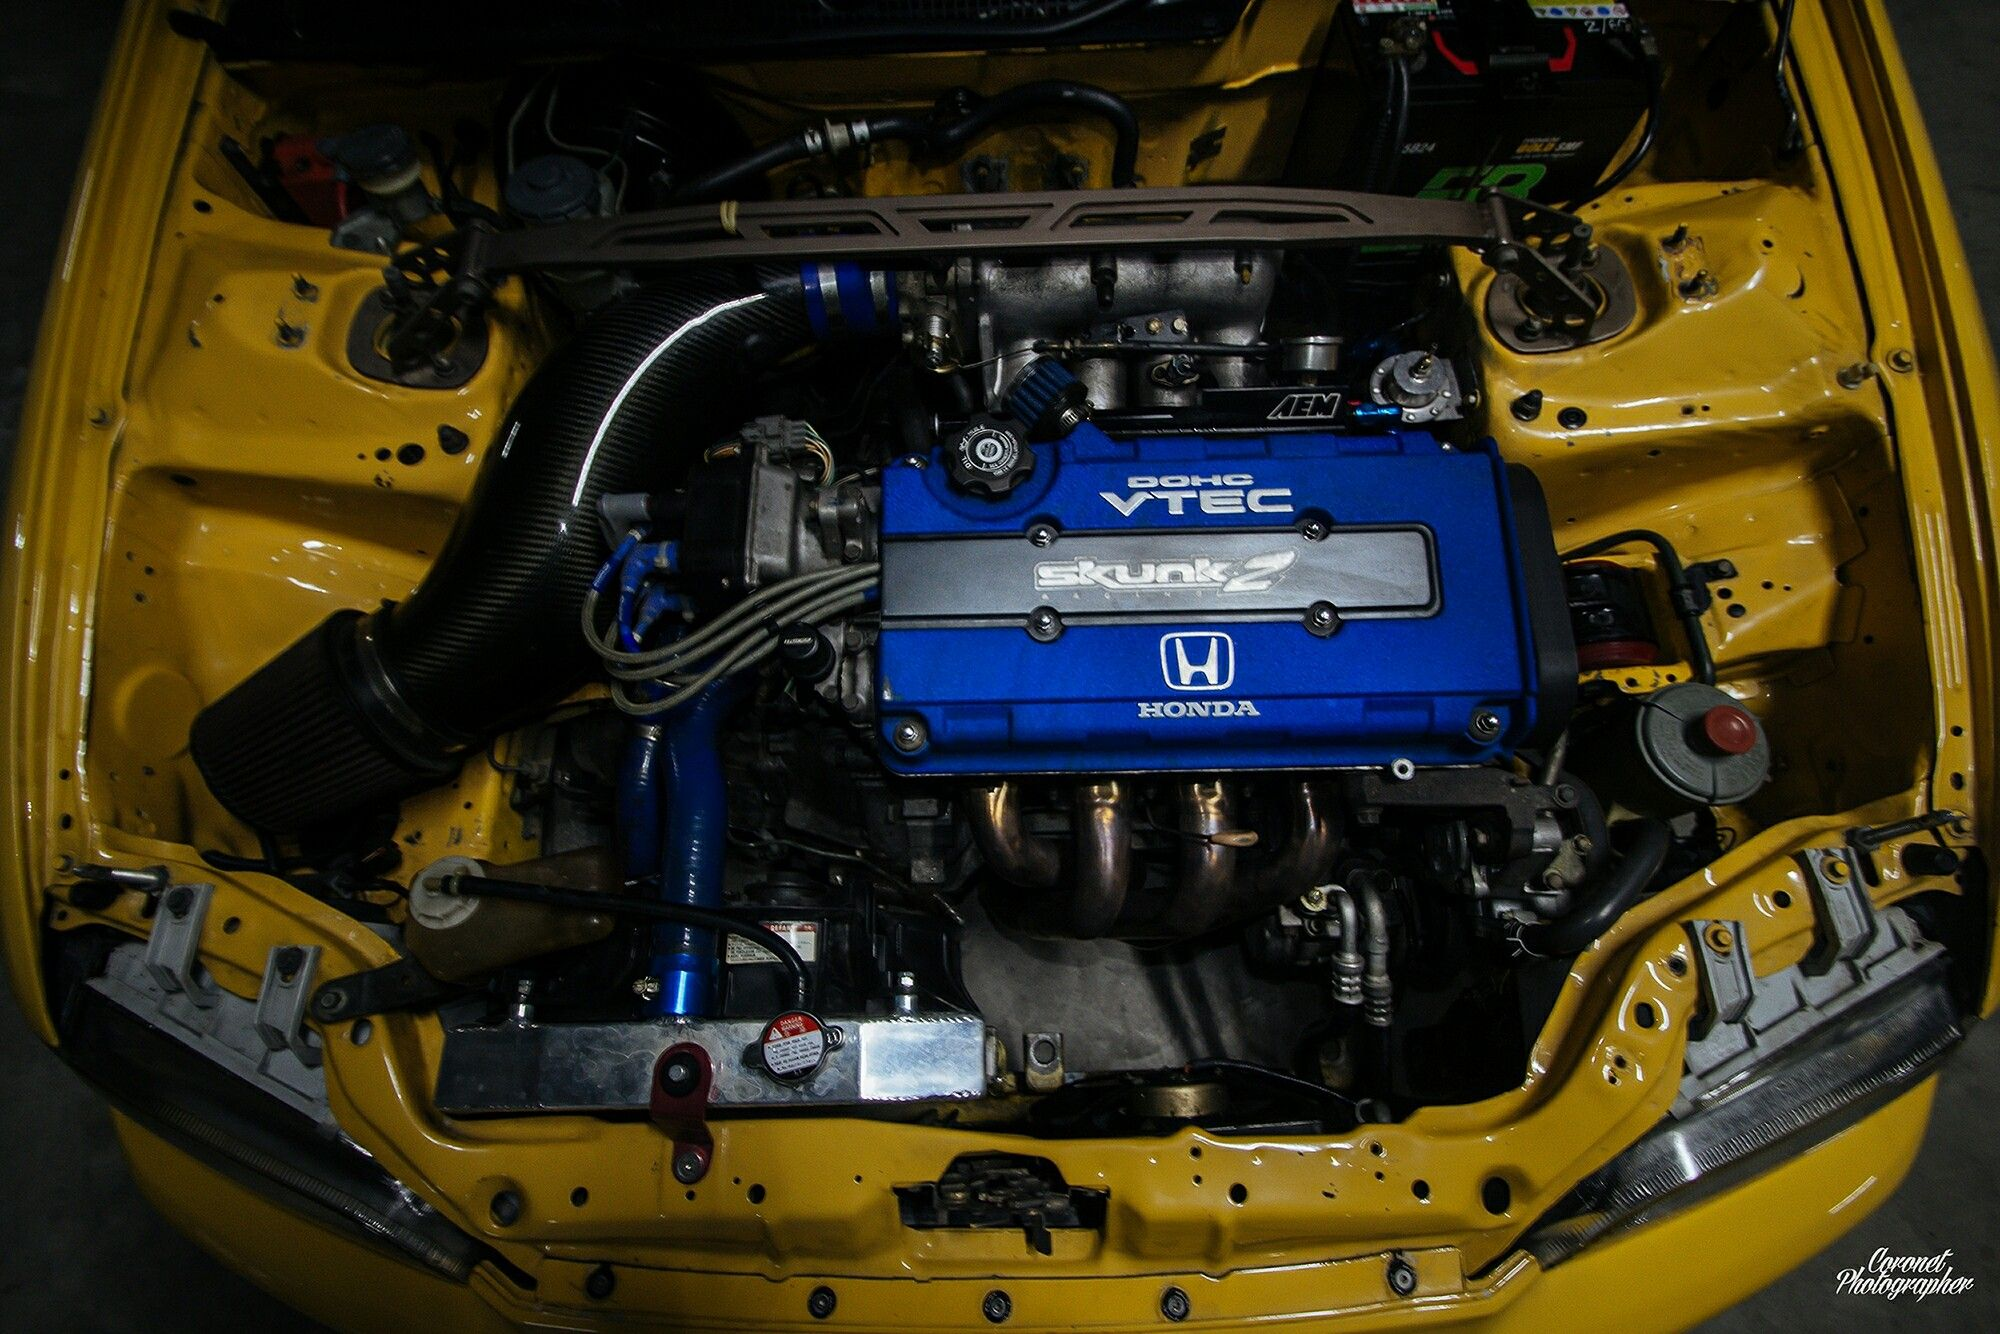 B16a Vtec Solenoid Wiring Diagram Car Stereo Amp Red Civic Eg6 B16 Engine By Predator11 On Deviantart Stuff